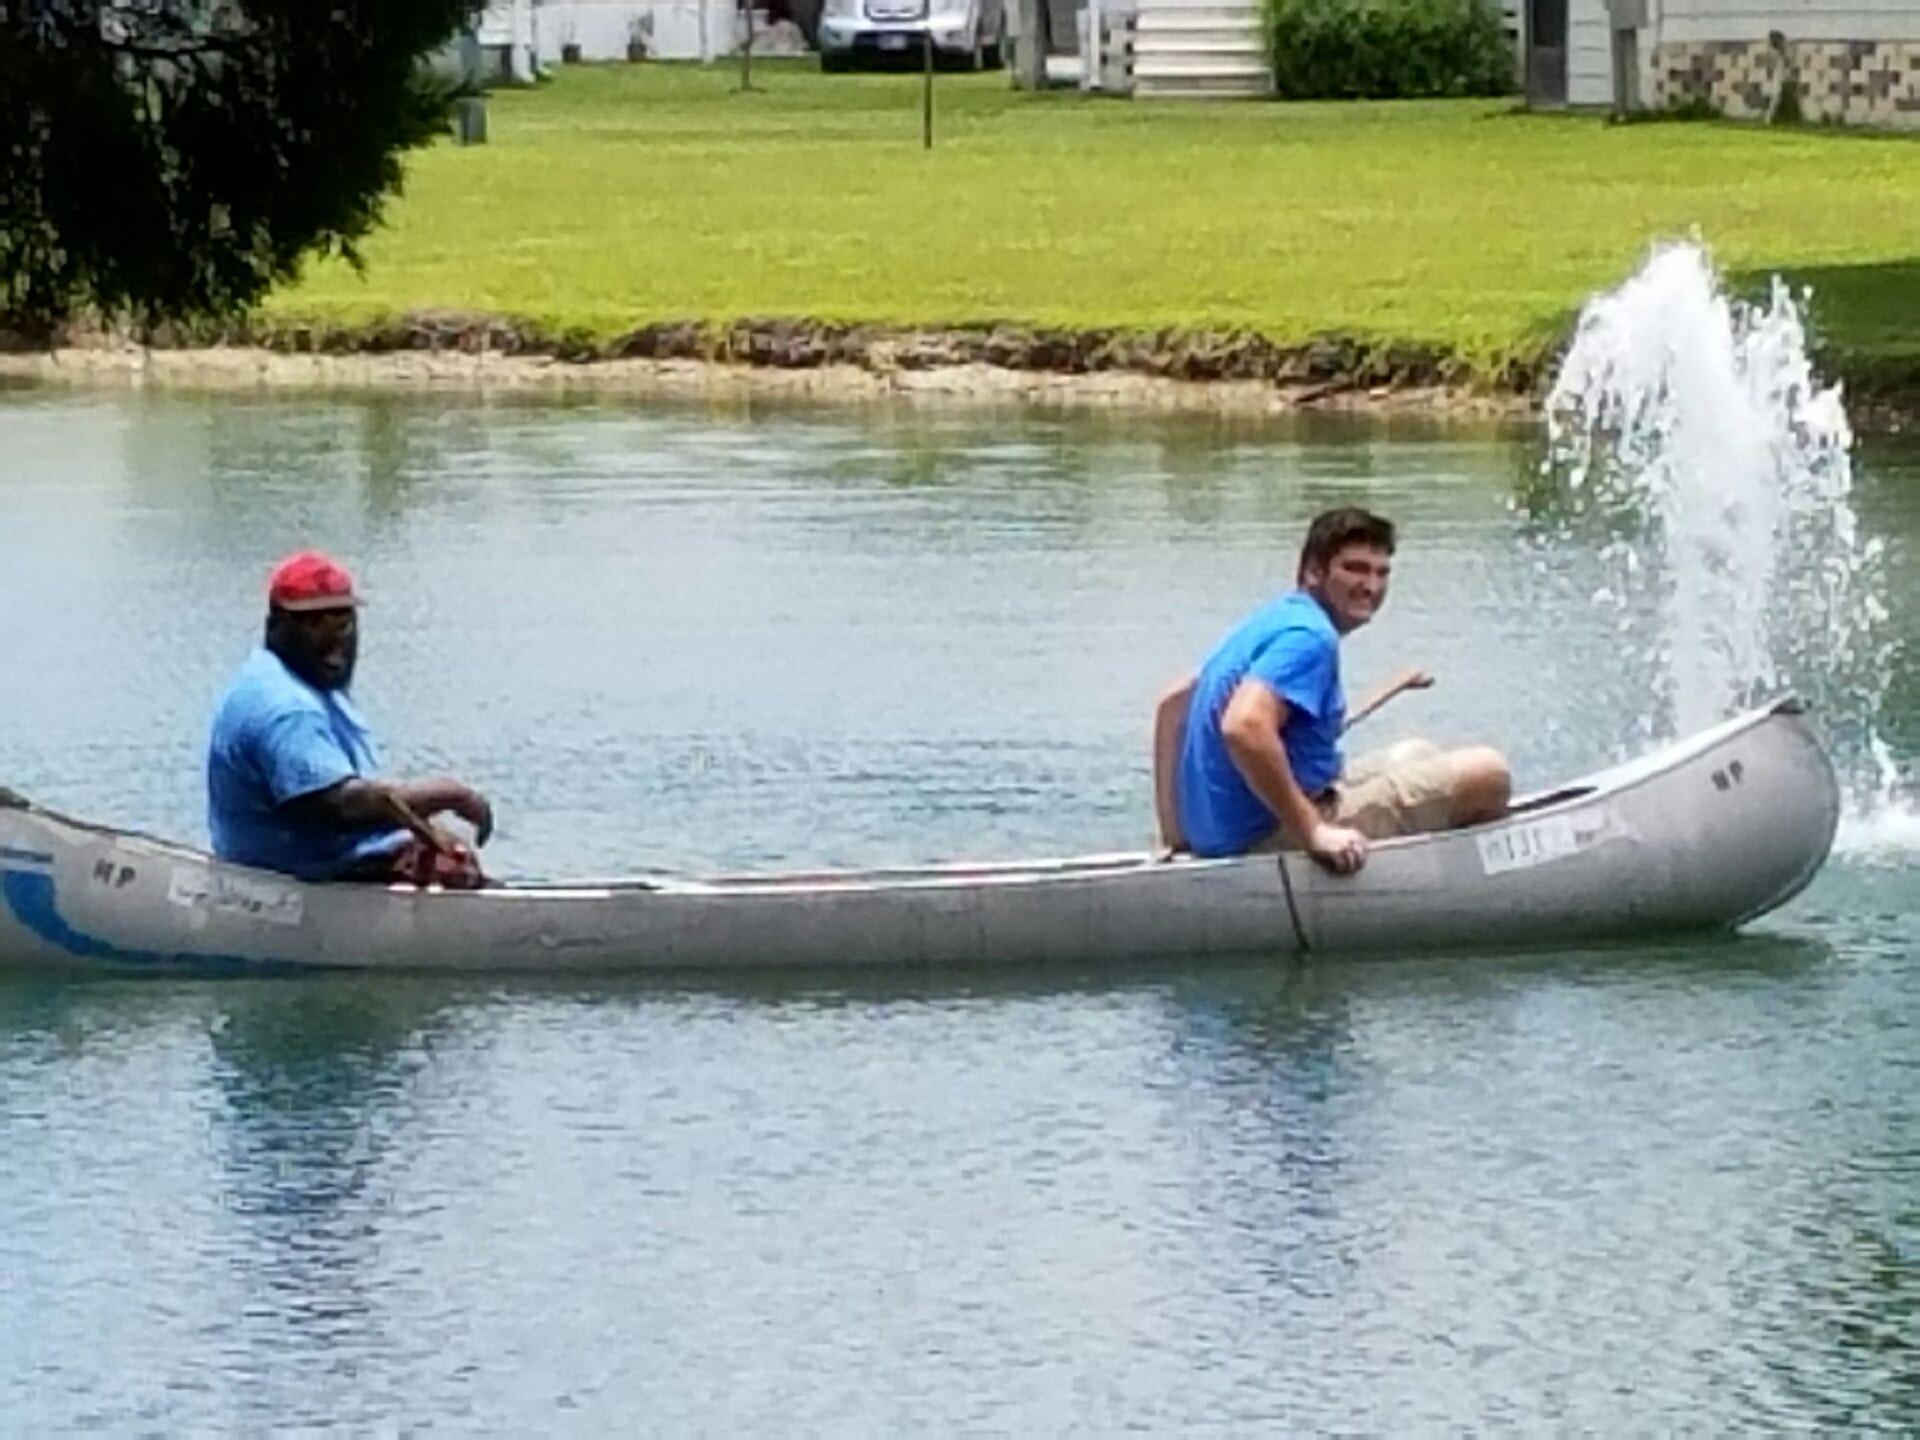 May contain: person, human, transportation, rowboat, boat, vehicle, and canoe